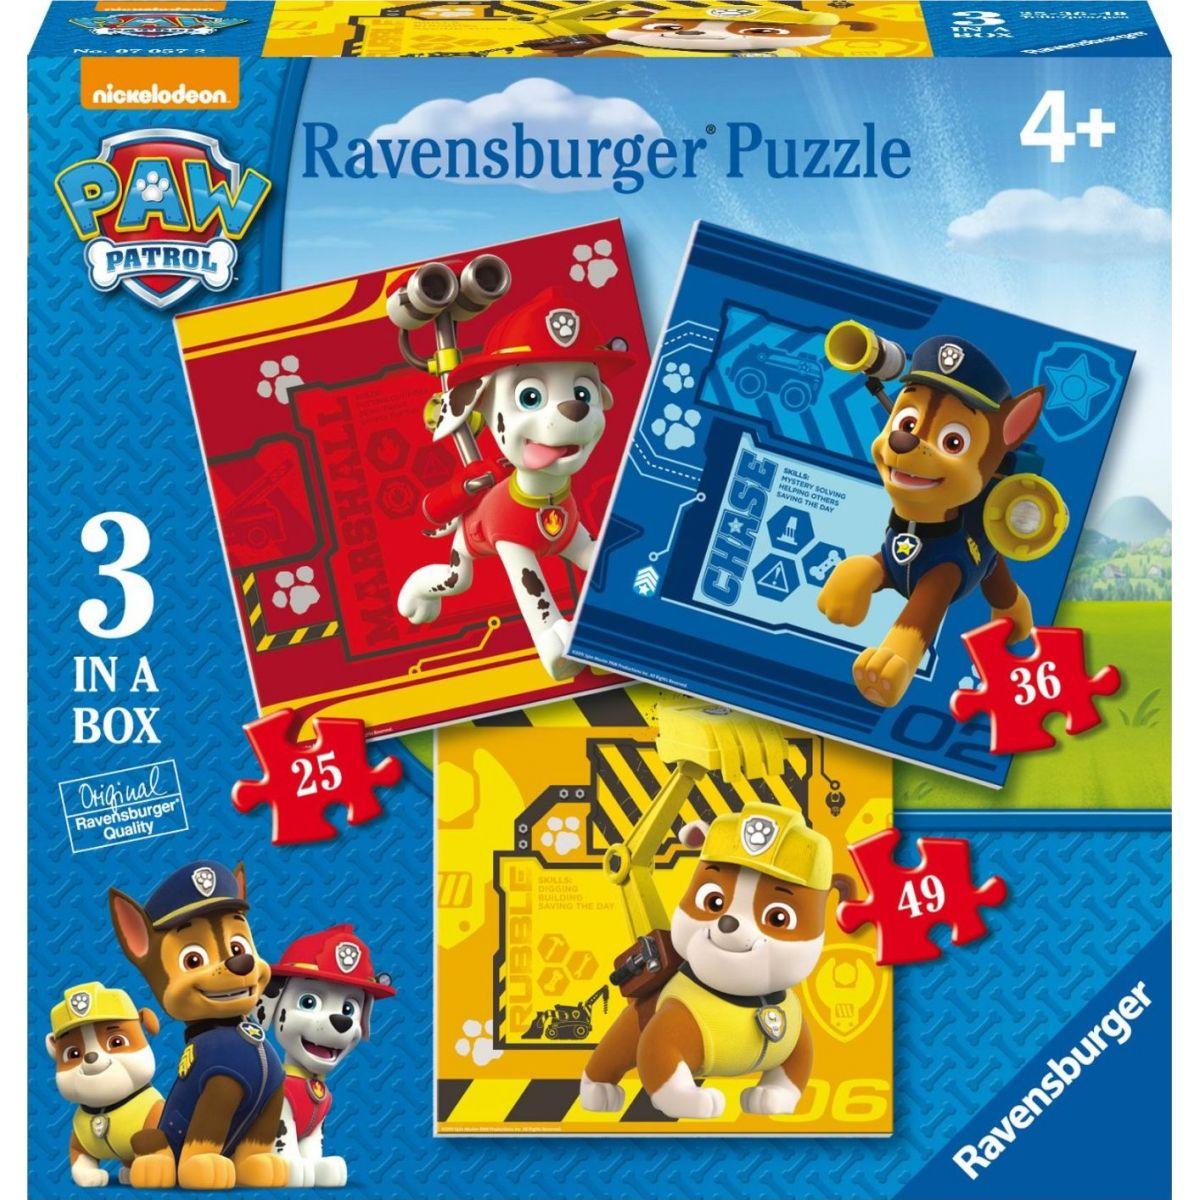 Ravensburger Tlapková Patrola Rubble, Marshall & Chase puzzle 25,36,49 dielikov